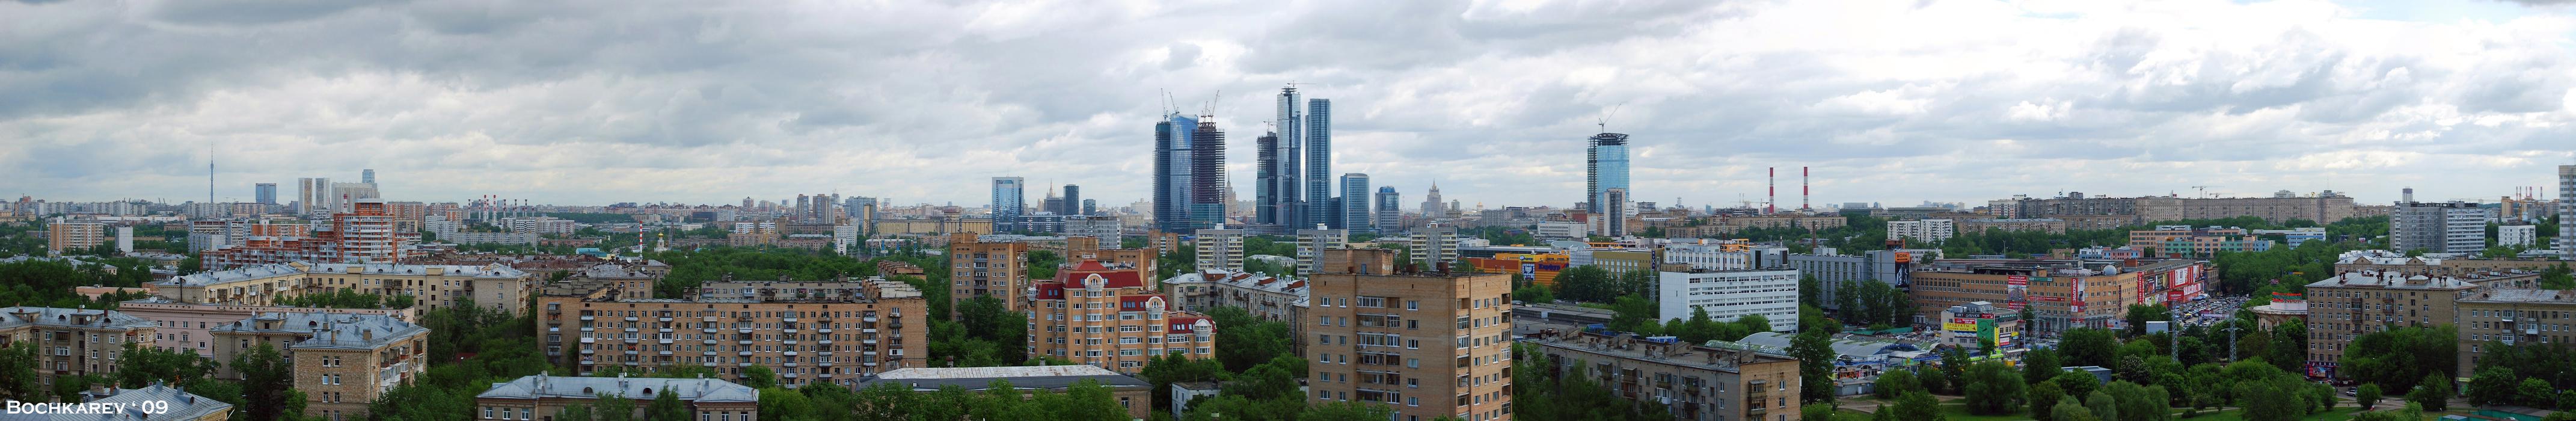 http://img-fotki.yandex.ru/get/3612/bochkarev009.1e/0_116dd_1c7cd067_orig